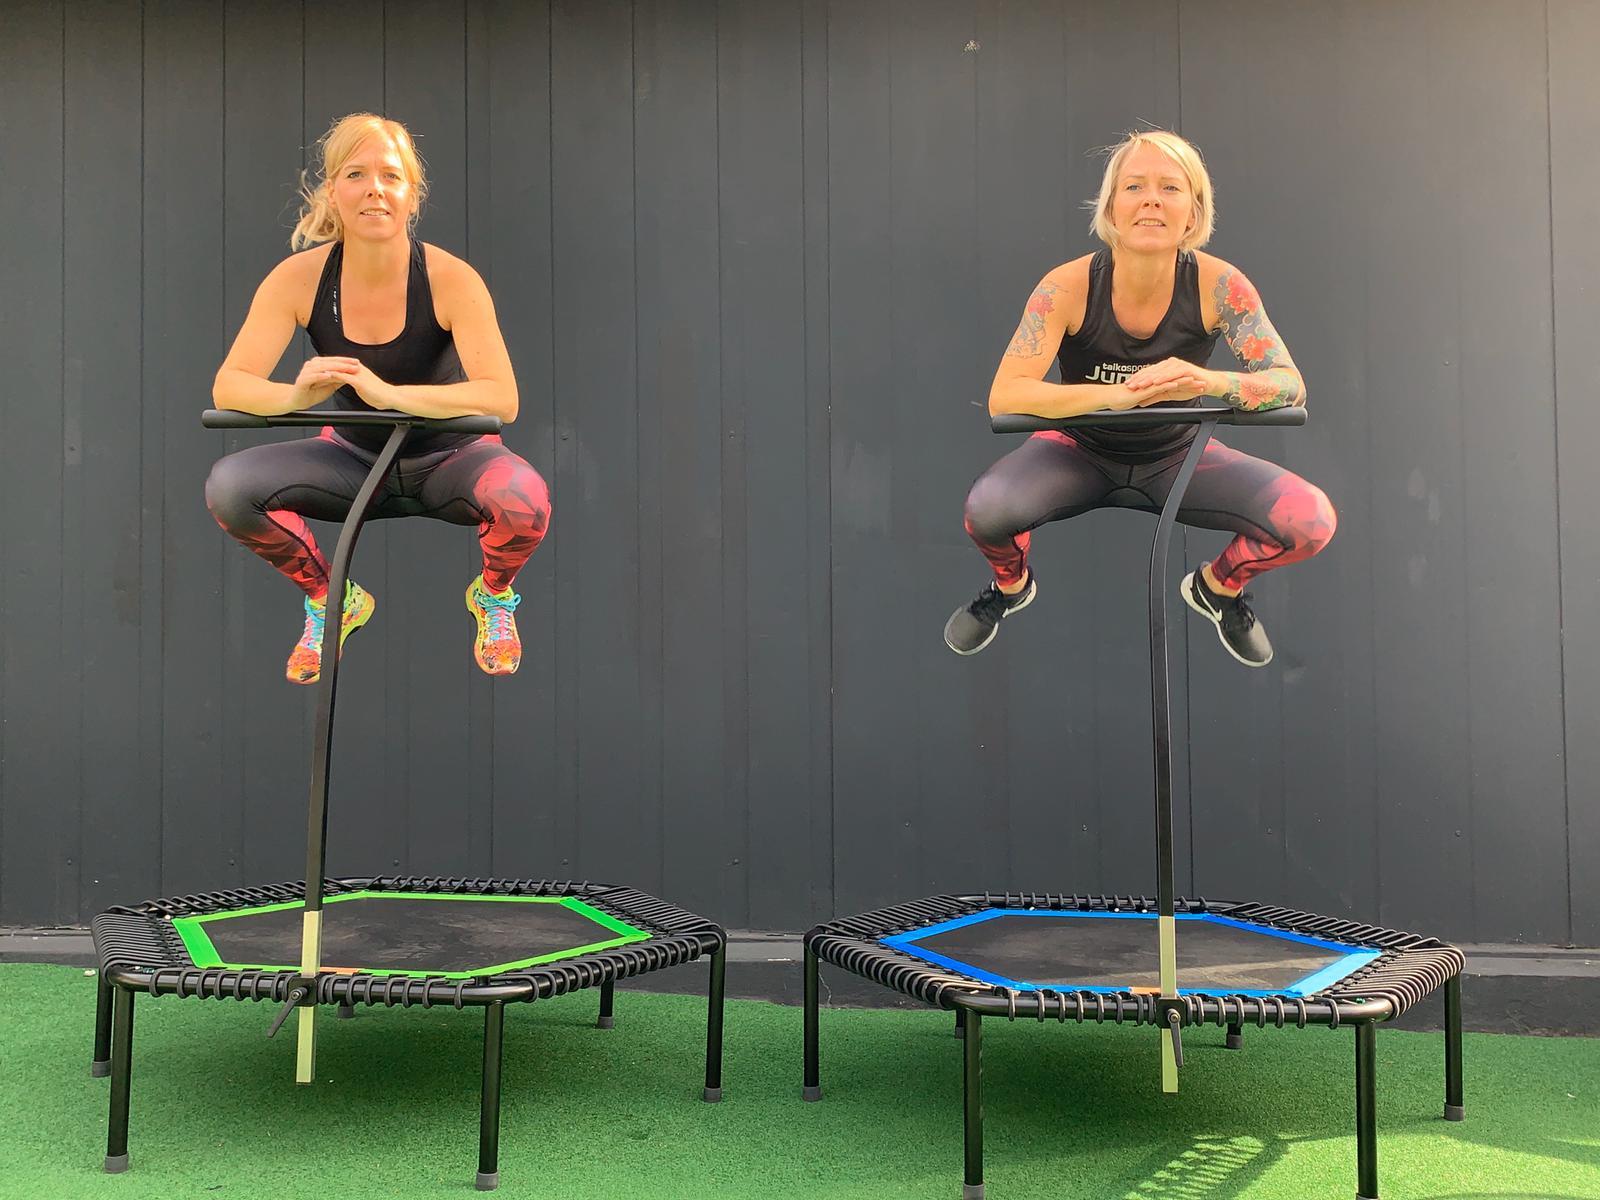 Bild der Jumping Fitness Instruktoren